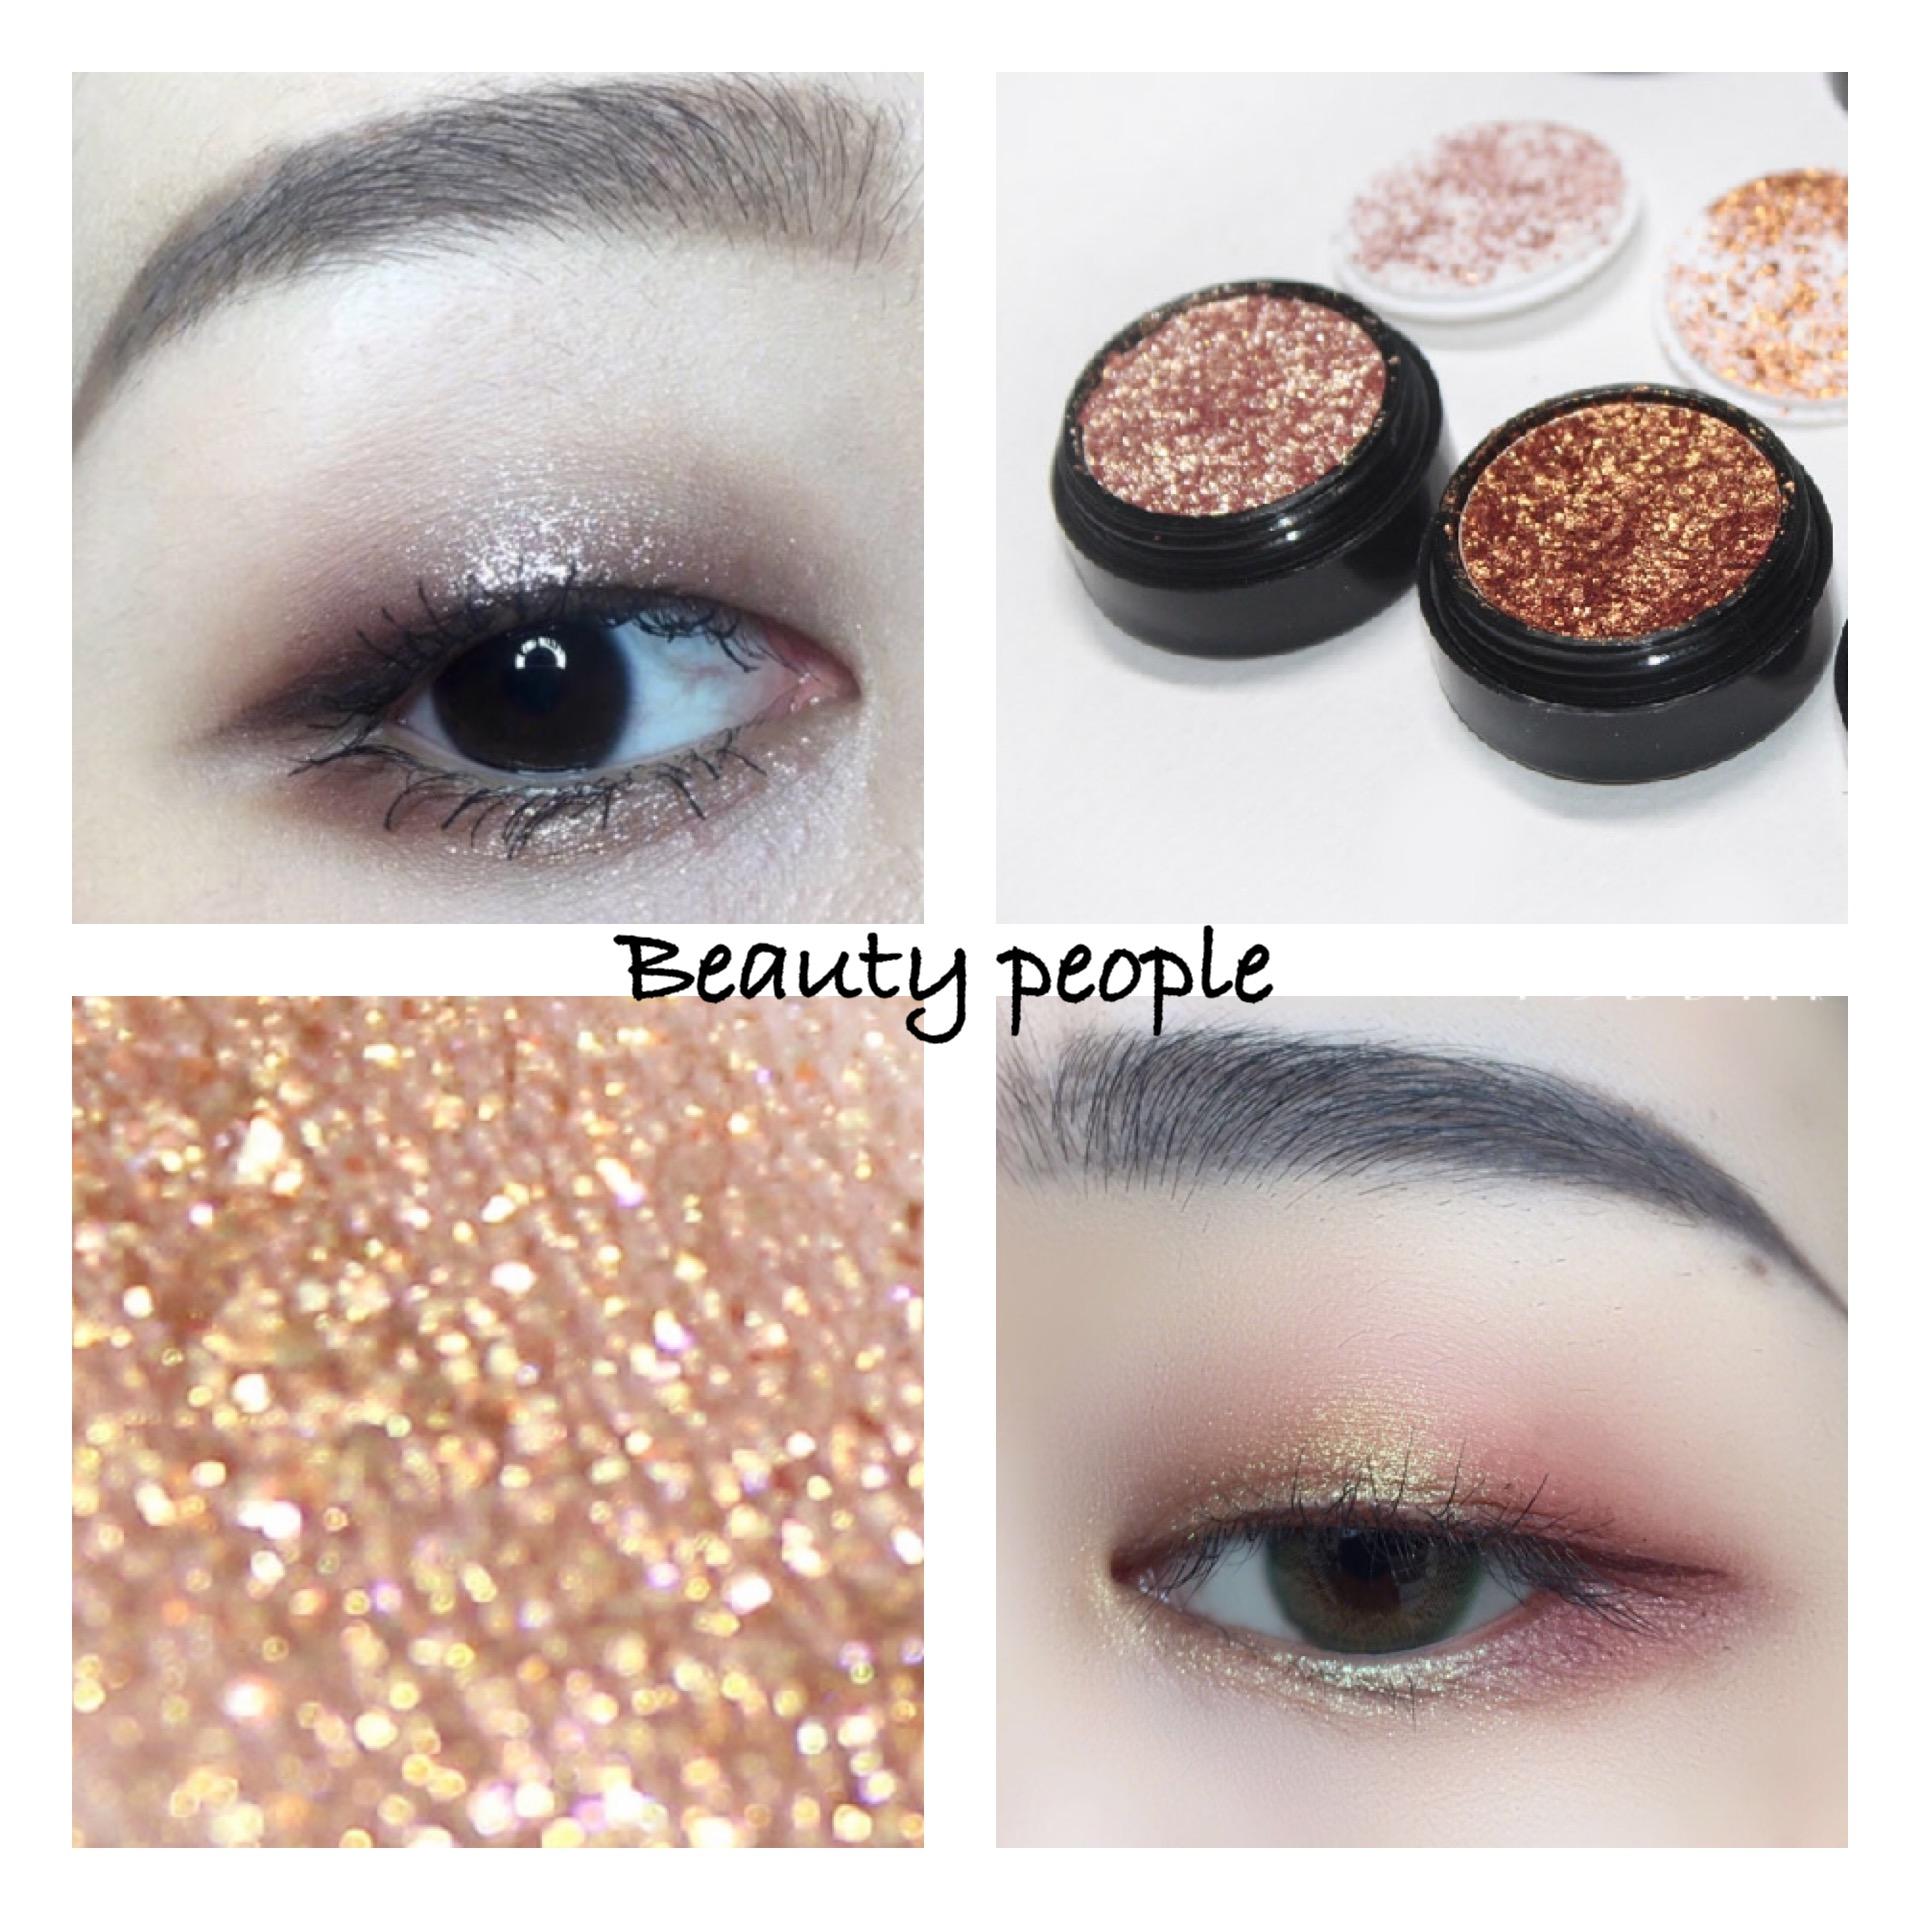 South Korea beautypeople pearl eye shadow, earth color nude make-up, silkworm diamond, super bright monochrome high gloss waterproof